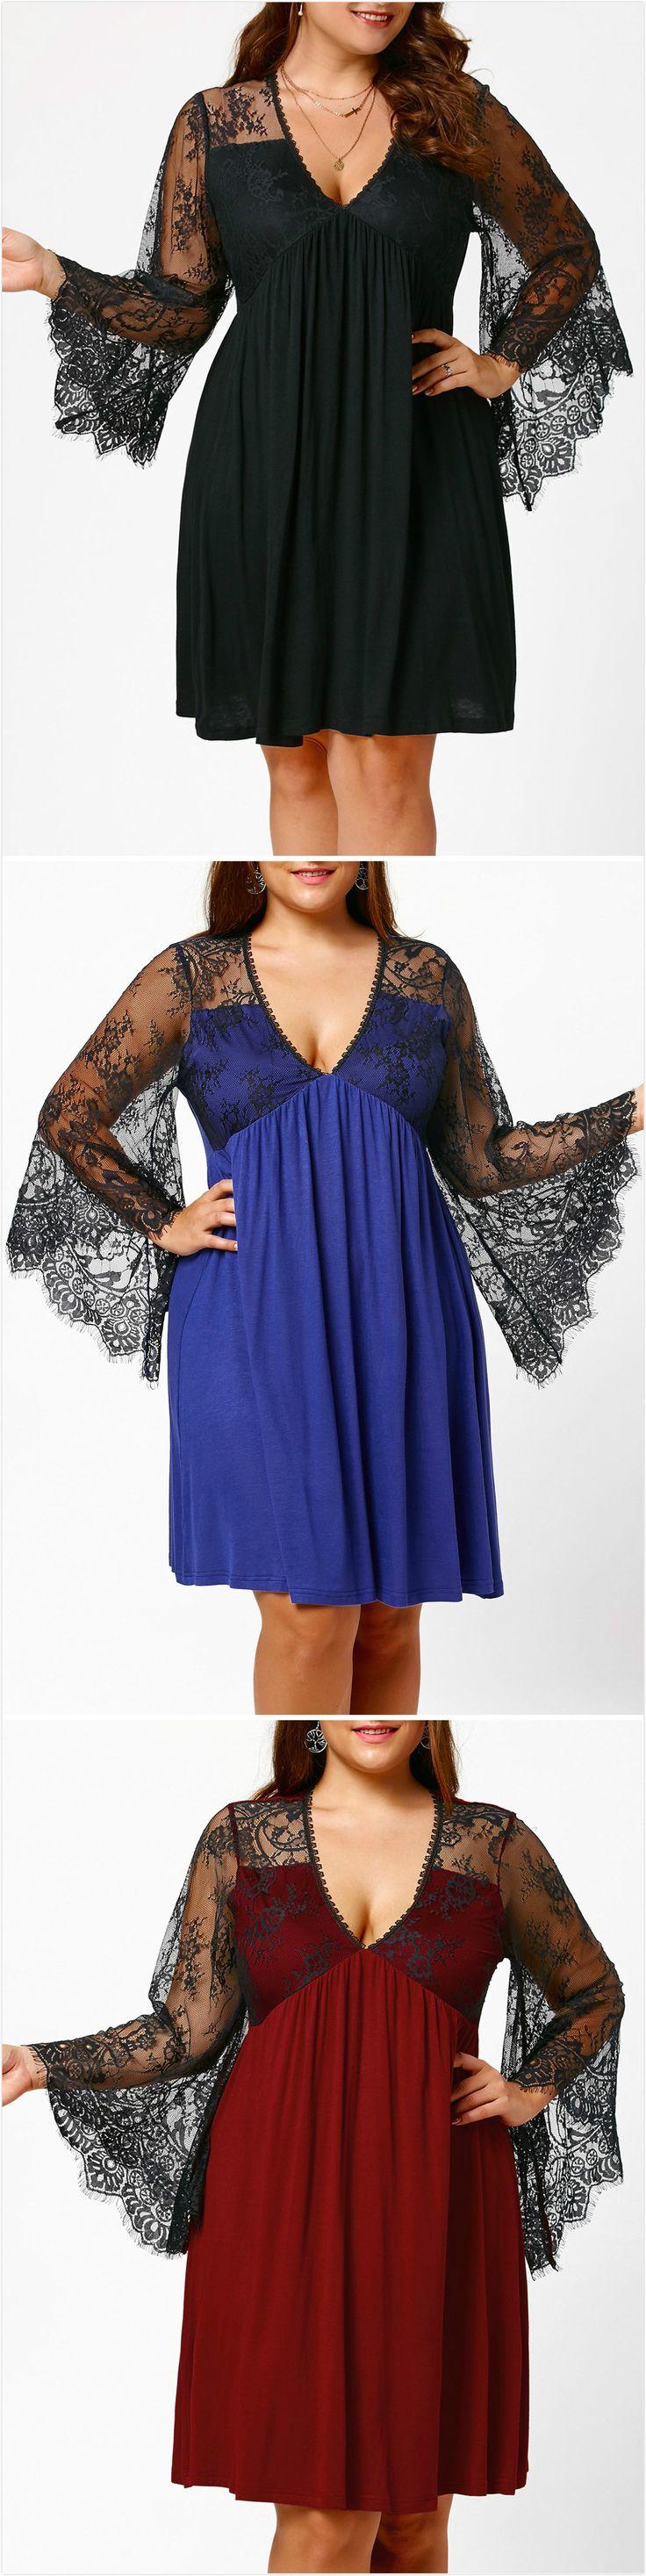 Empire Waist Plus Size Tunic Dress